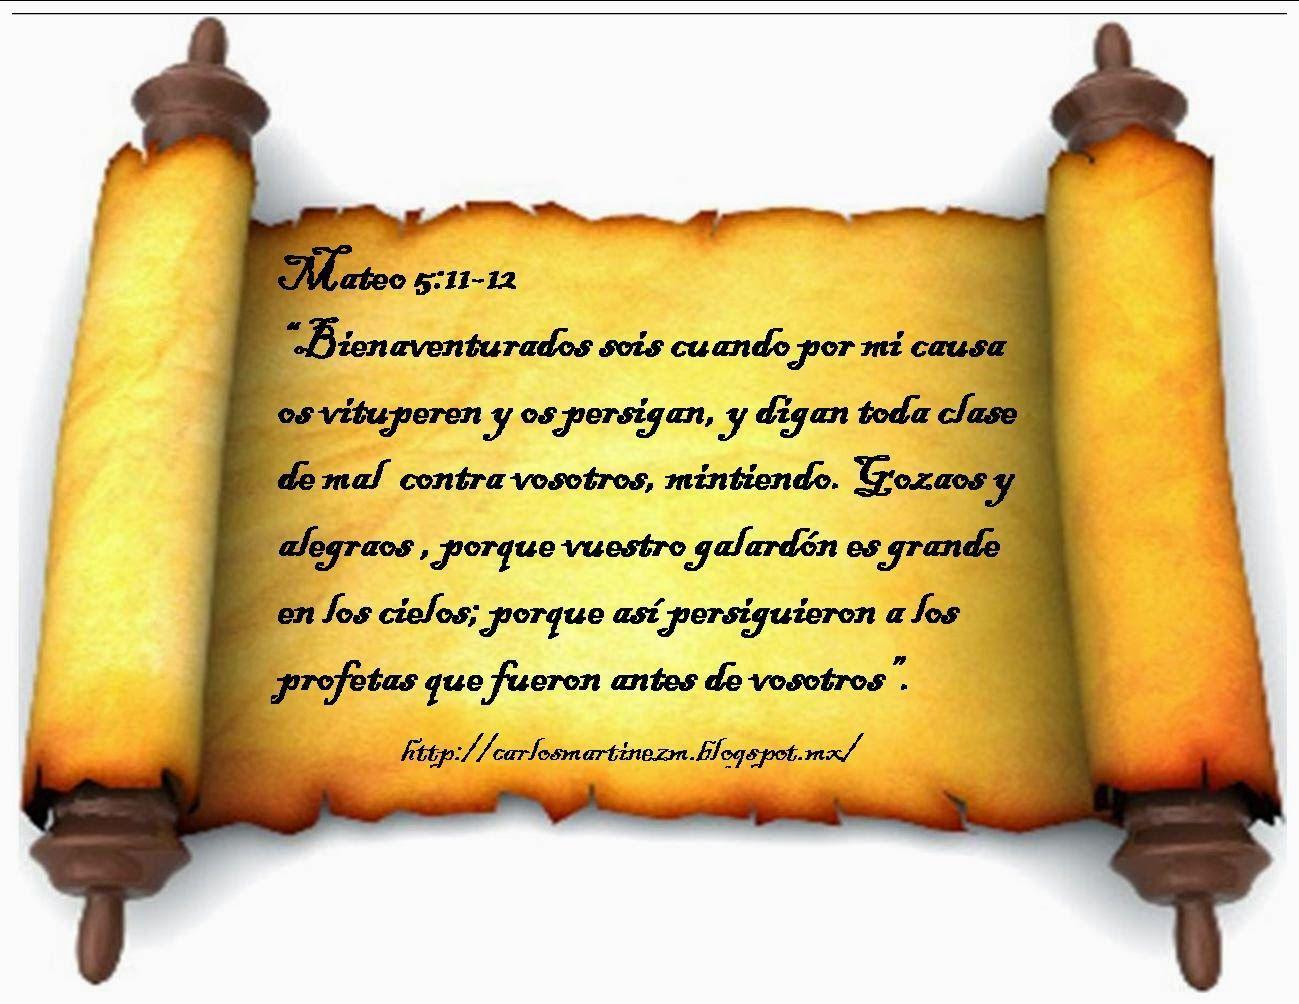 Carlos Martínez M Aprendiendo La Sana Doctrina Mateo 5 11